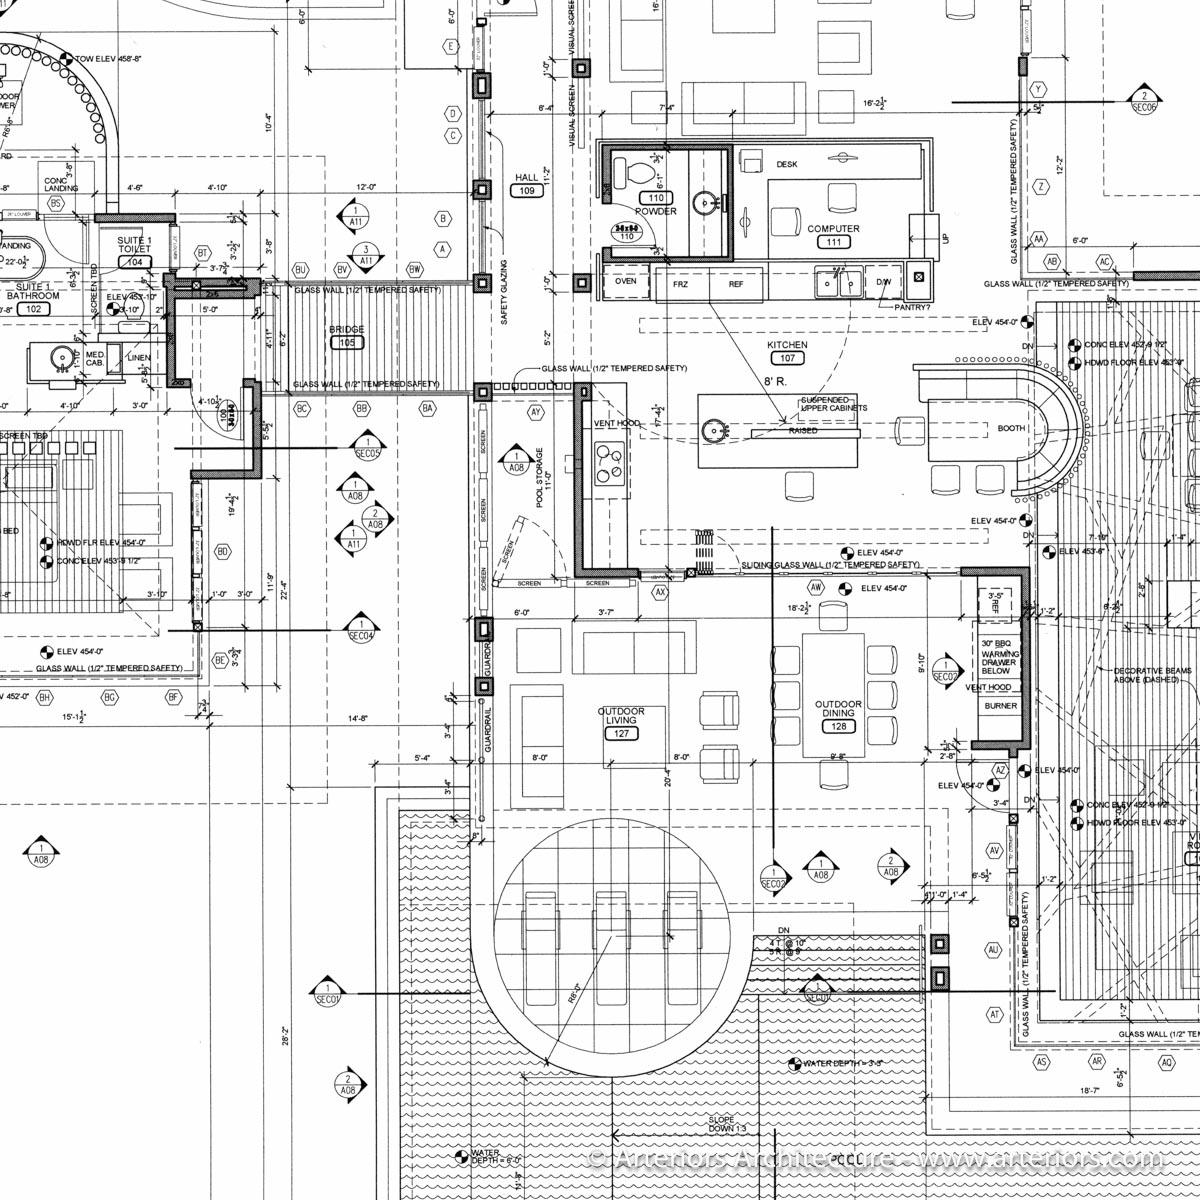 Construction Plan (1 of 50)